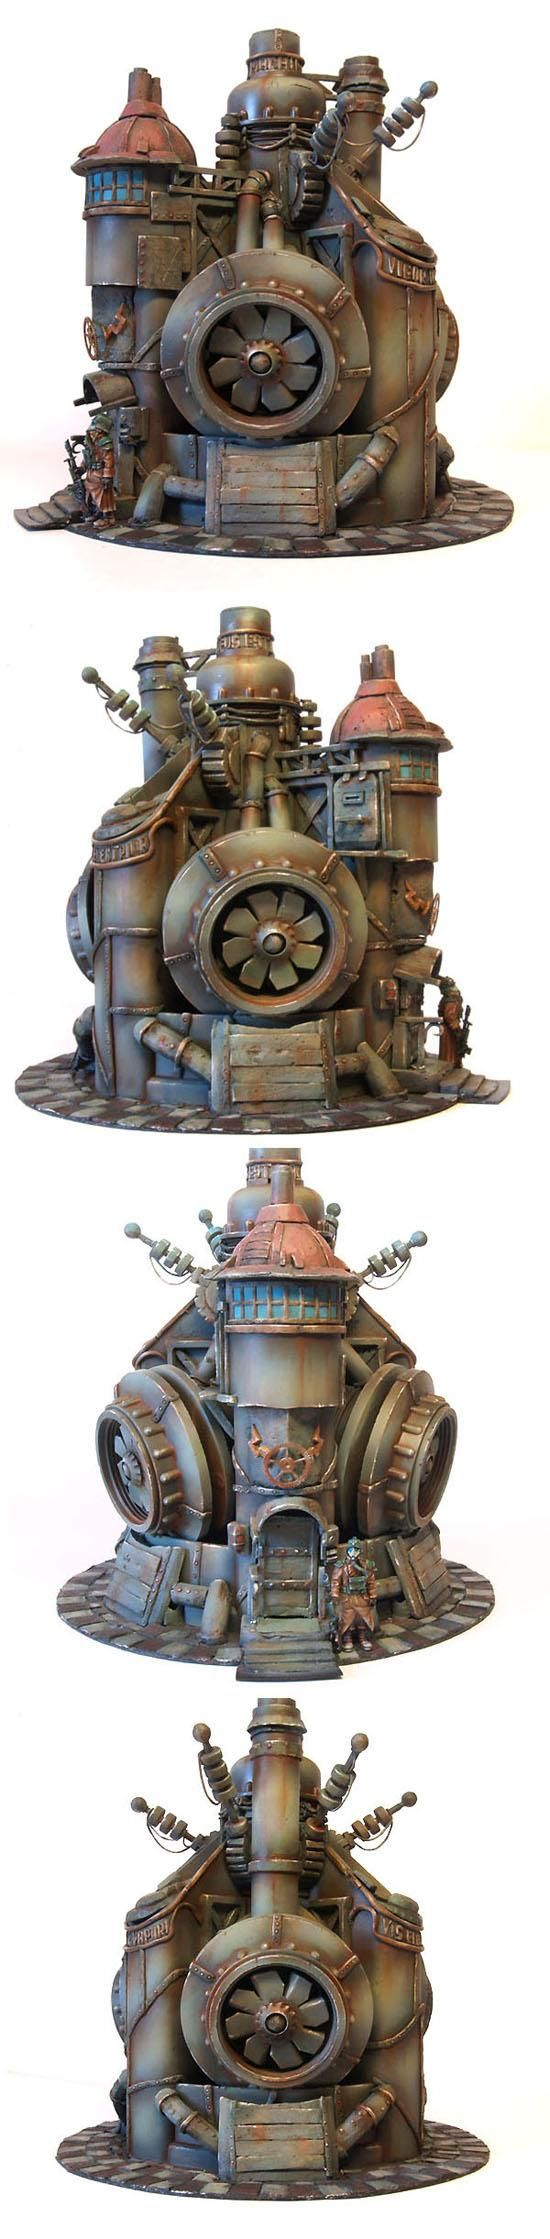 302717_md-Buildings, Factory, Power Plant, Scifi, Steam, Steampunk, Terrain, Wargame.jpg (550×2239)